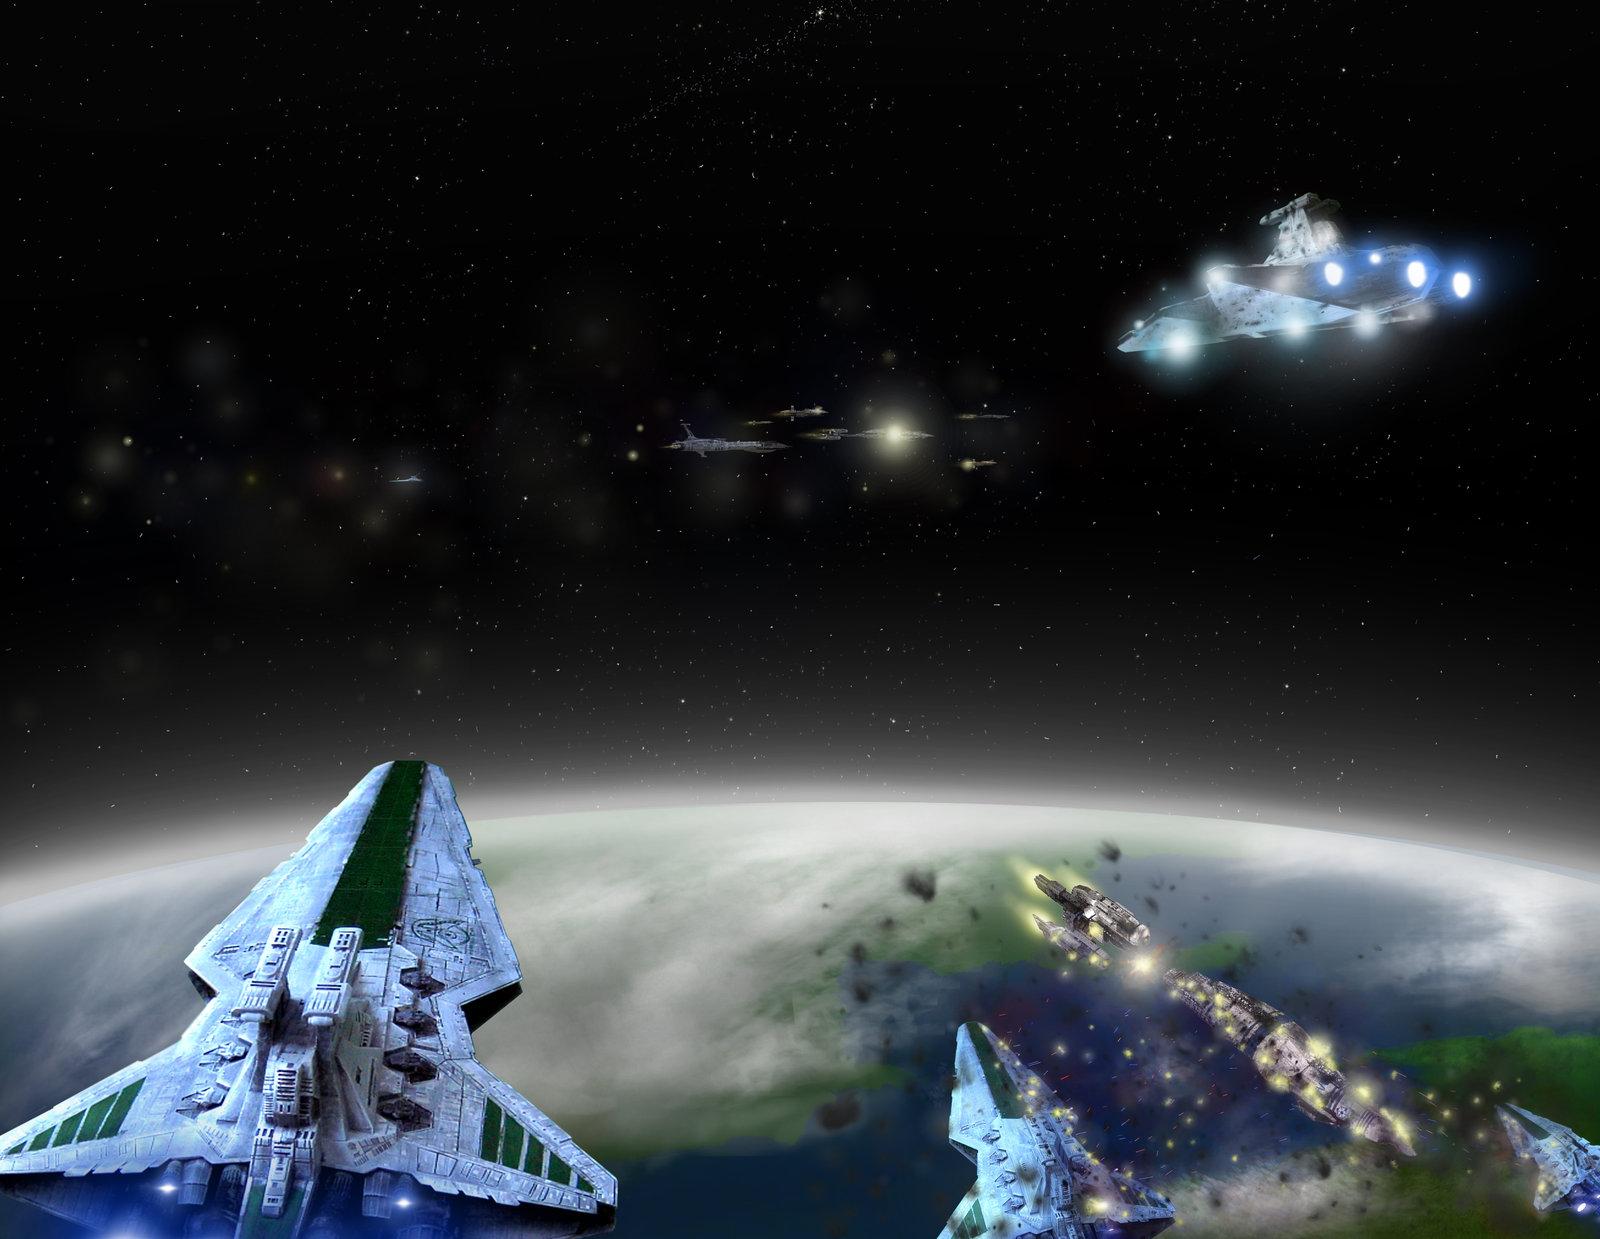 star wars space battle image 1600x1239